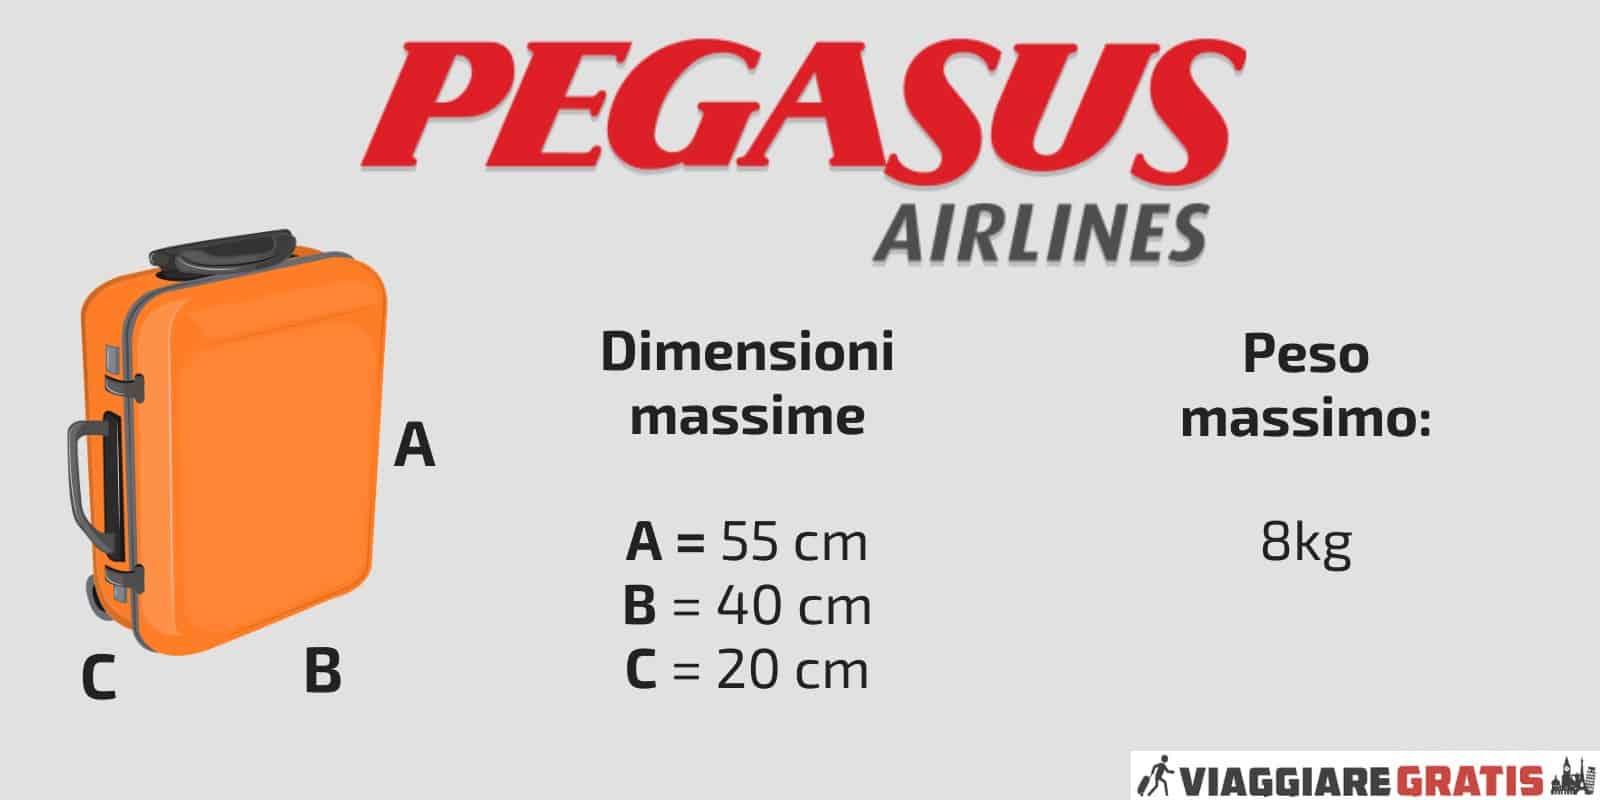 Bagaglio a mano Pegasus Airlines